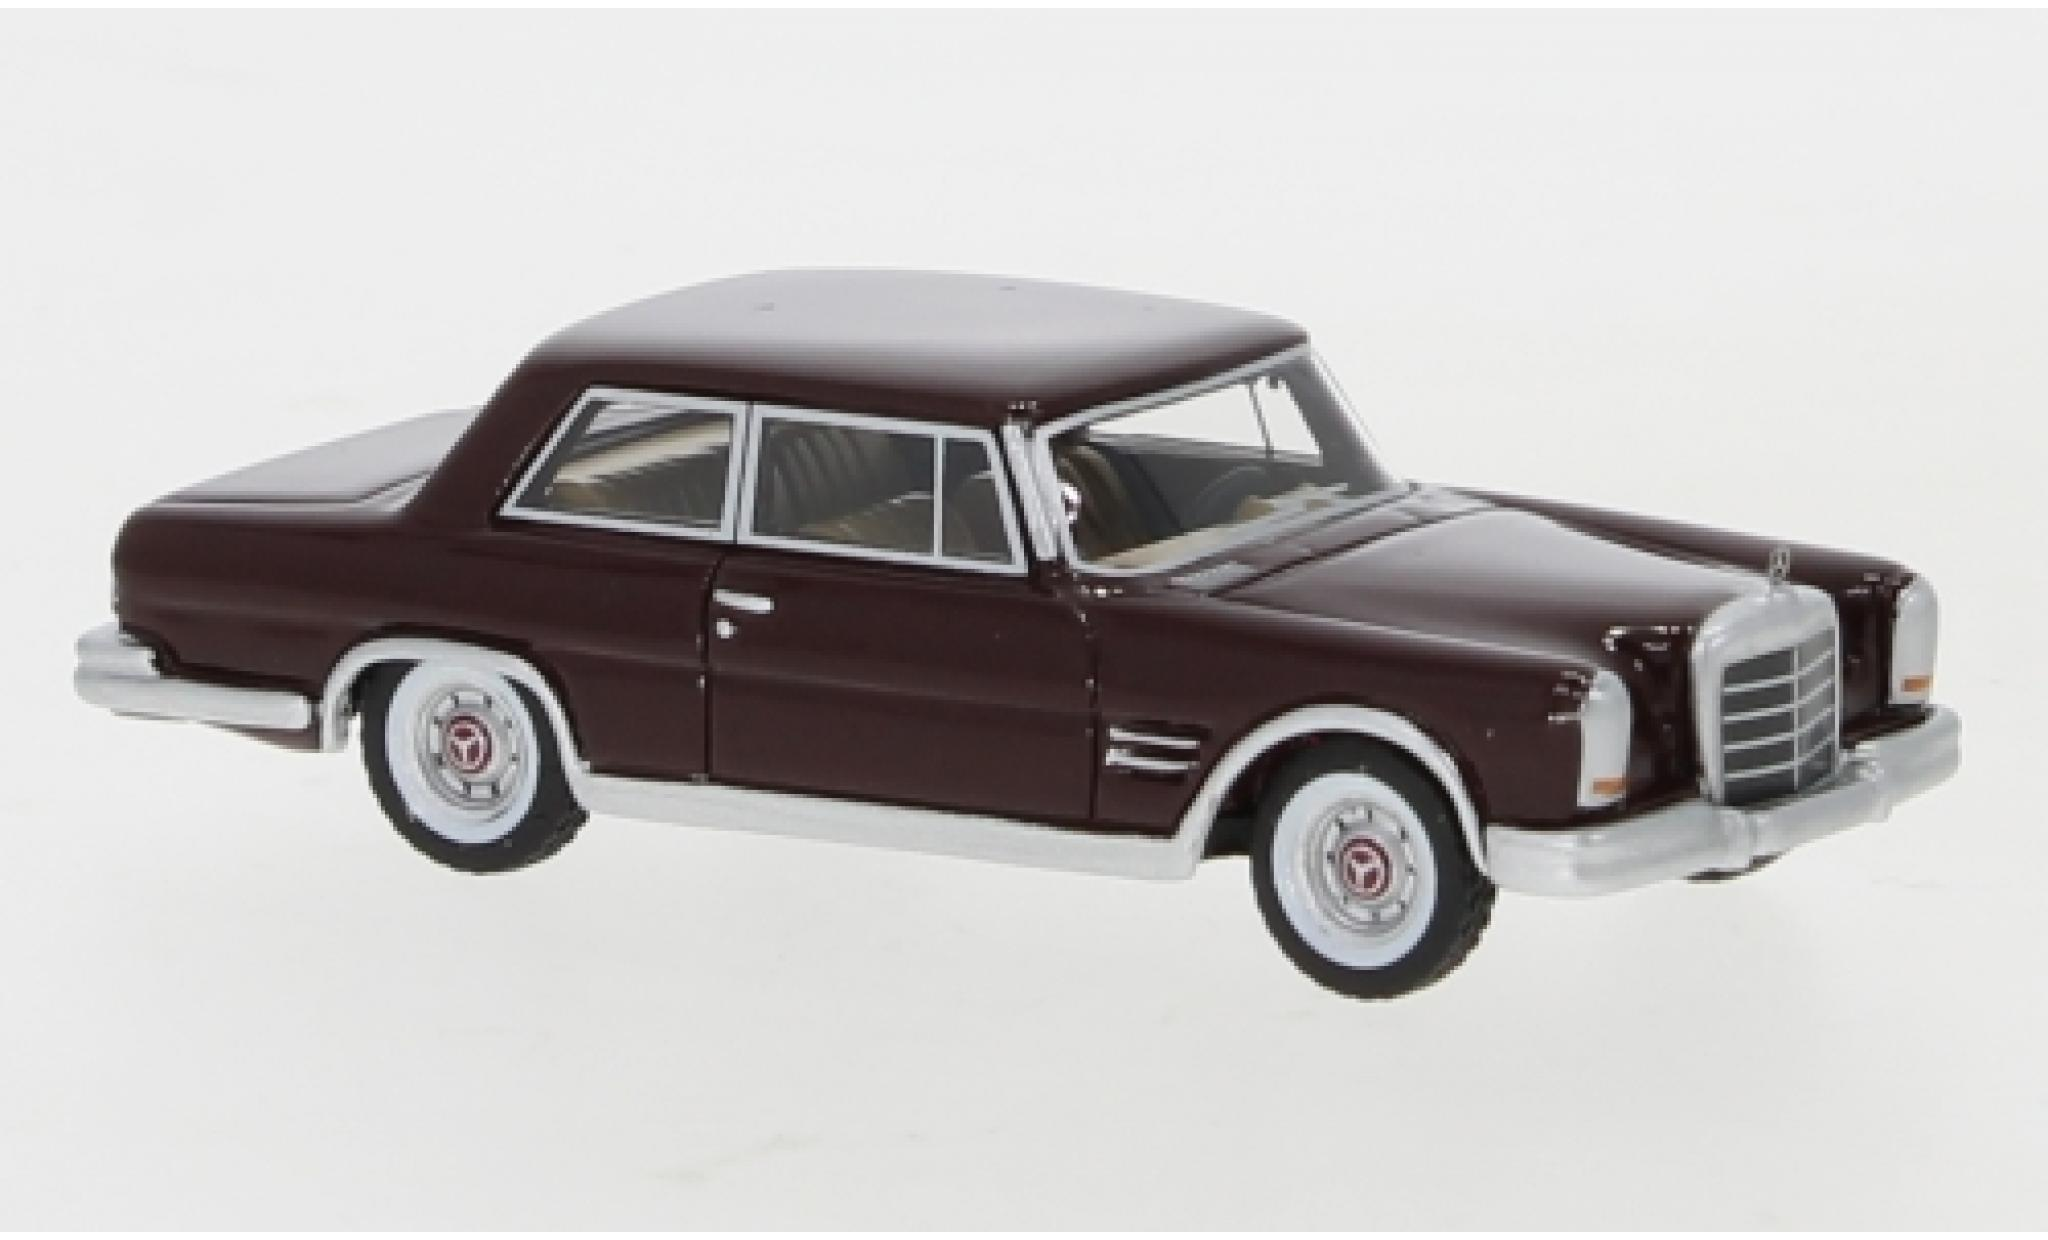 Mercedes 600 1/87 BoS Models (W100) Nallinger Coupé red 1963